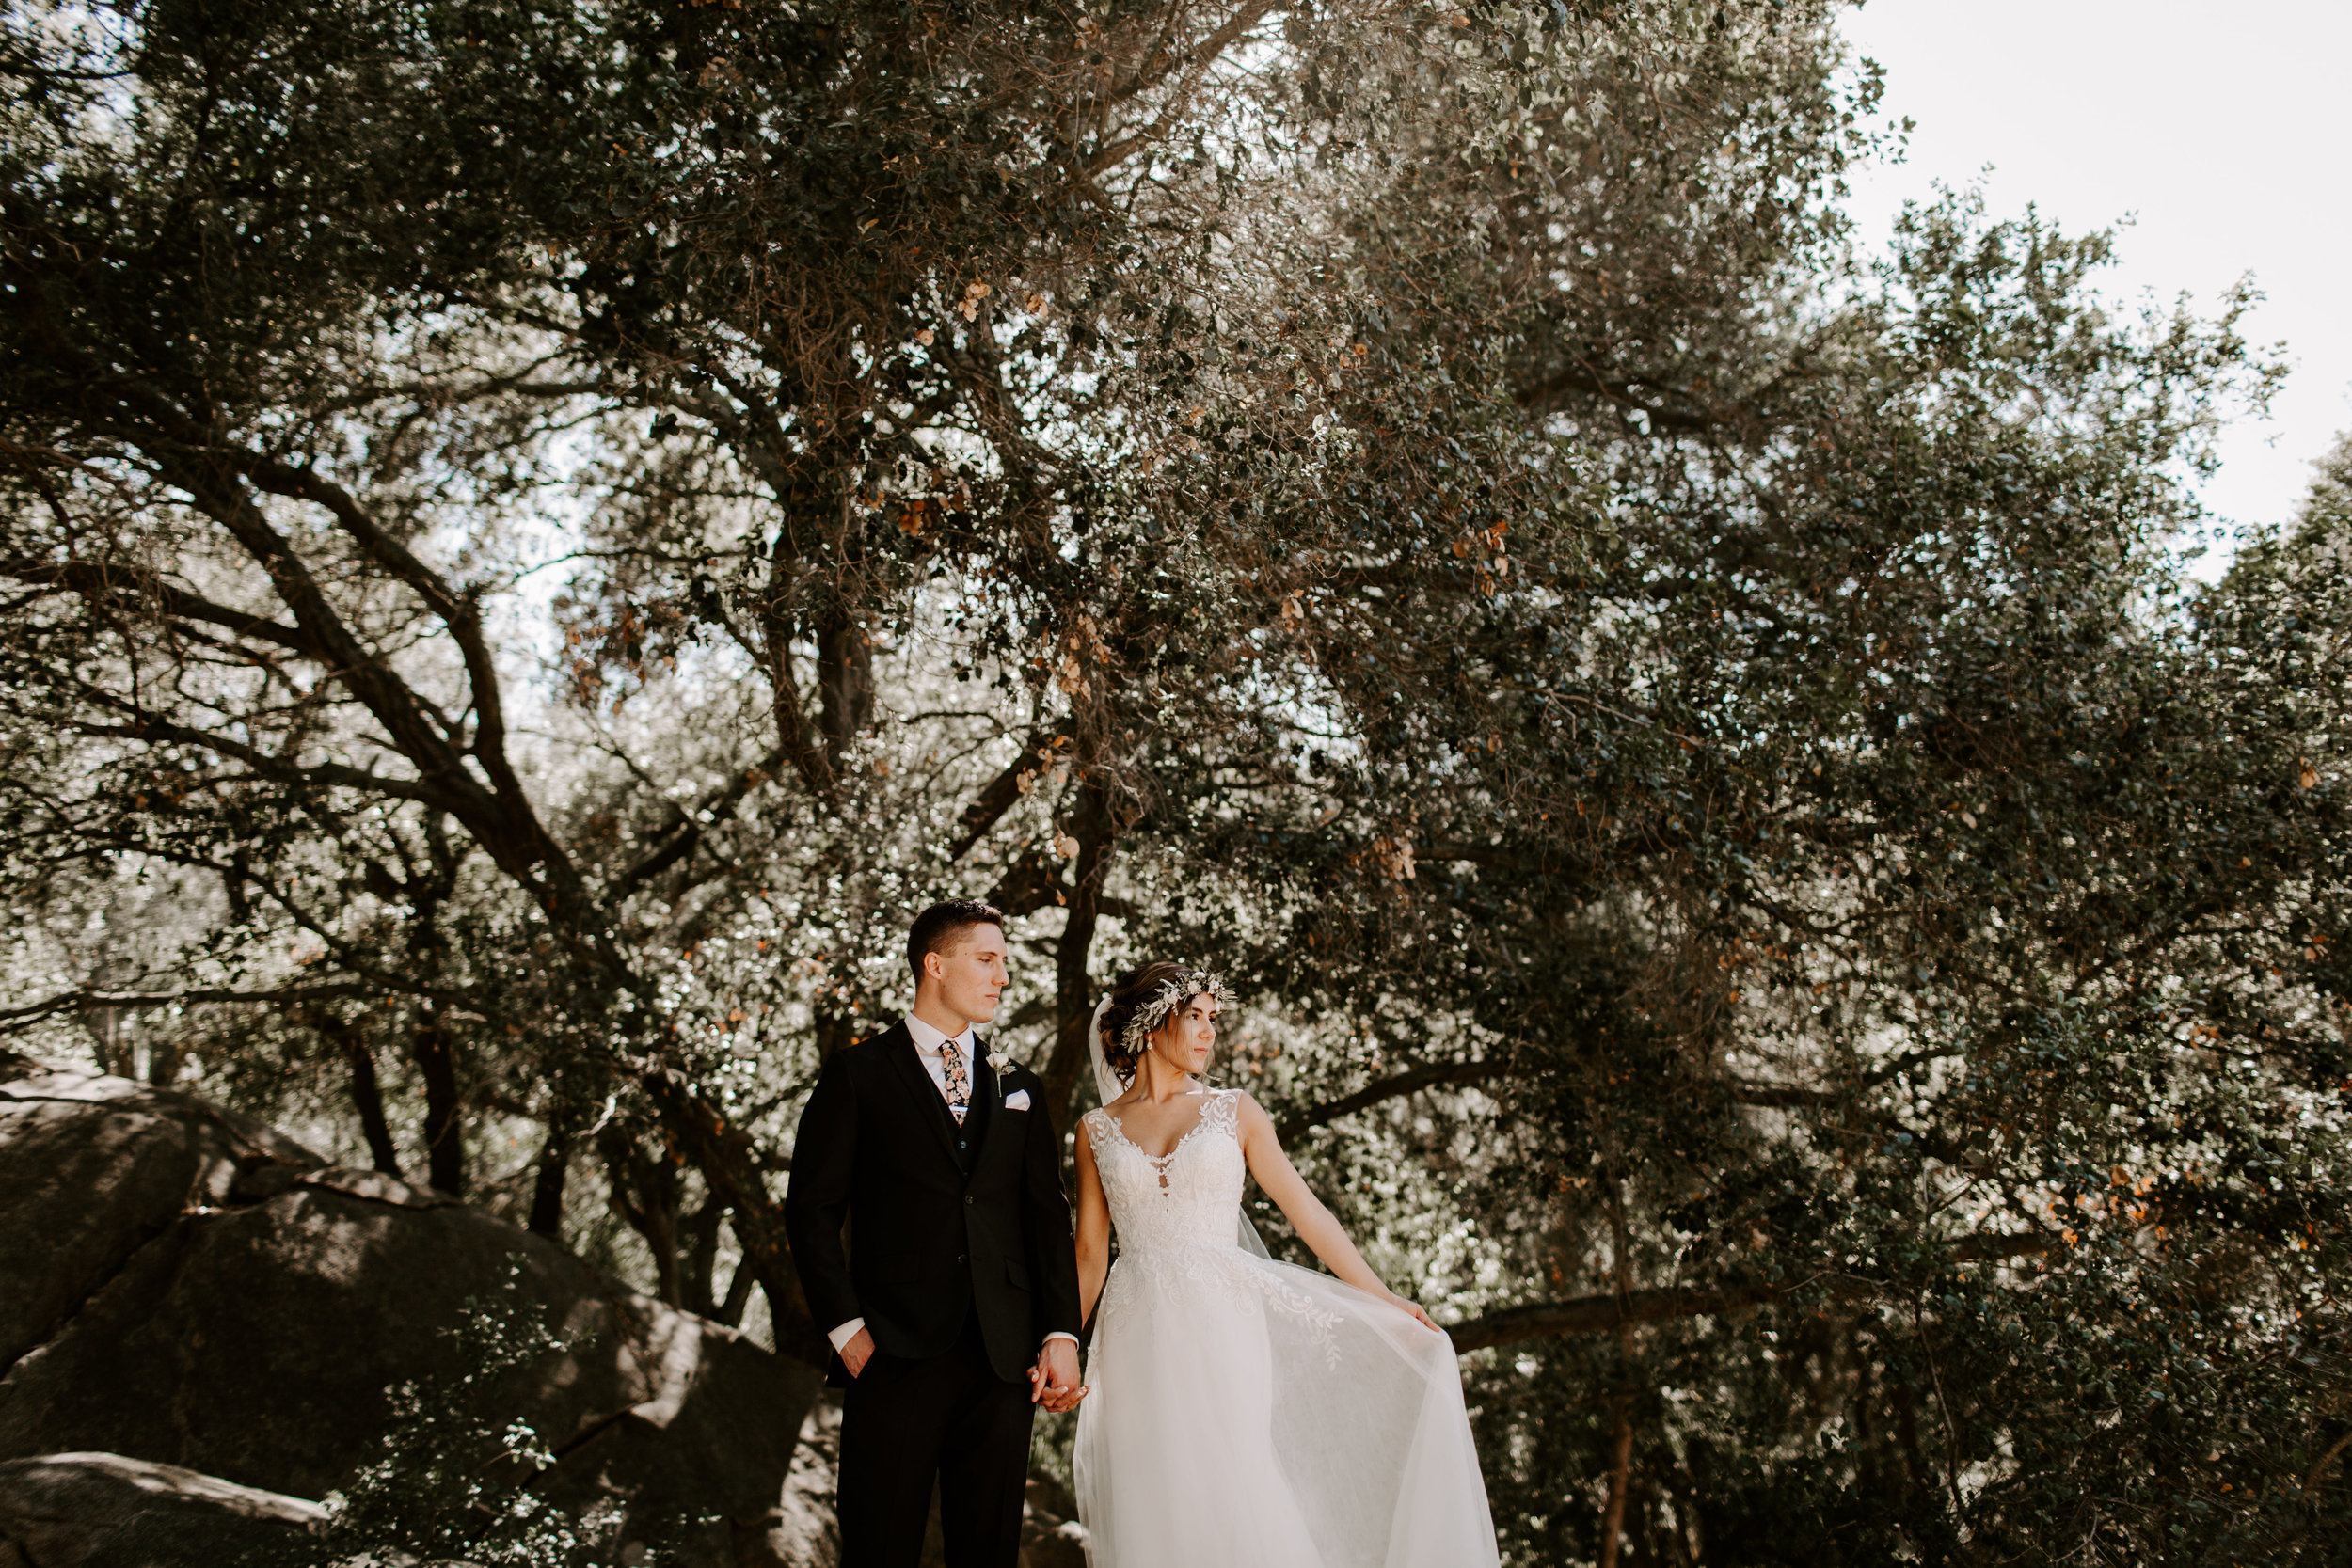 kate+zack_wedding_secludedgardenestate_temecula_madisonrylee_0649.jpg